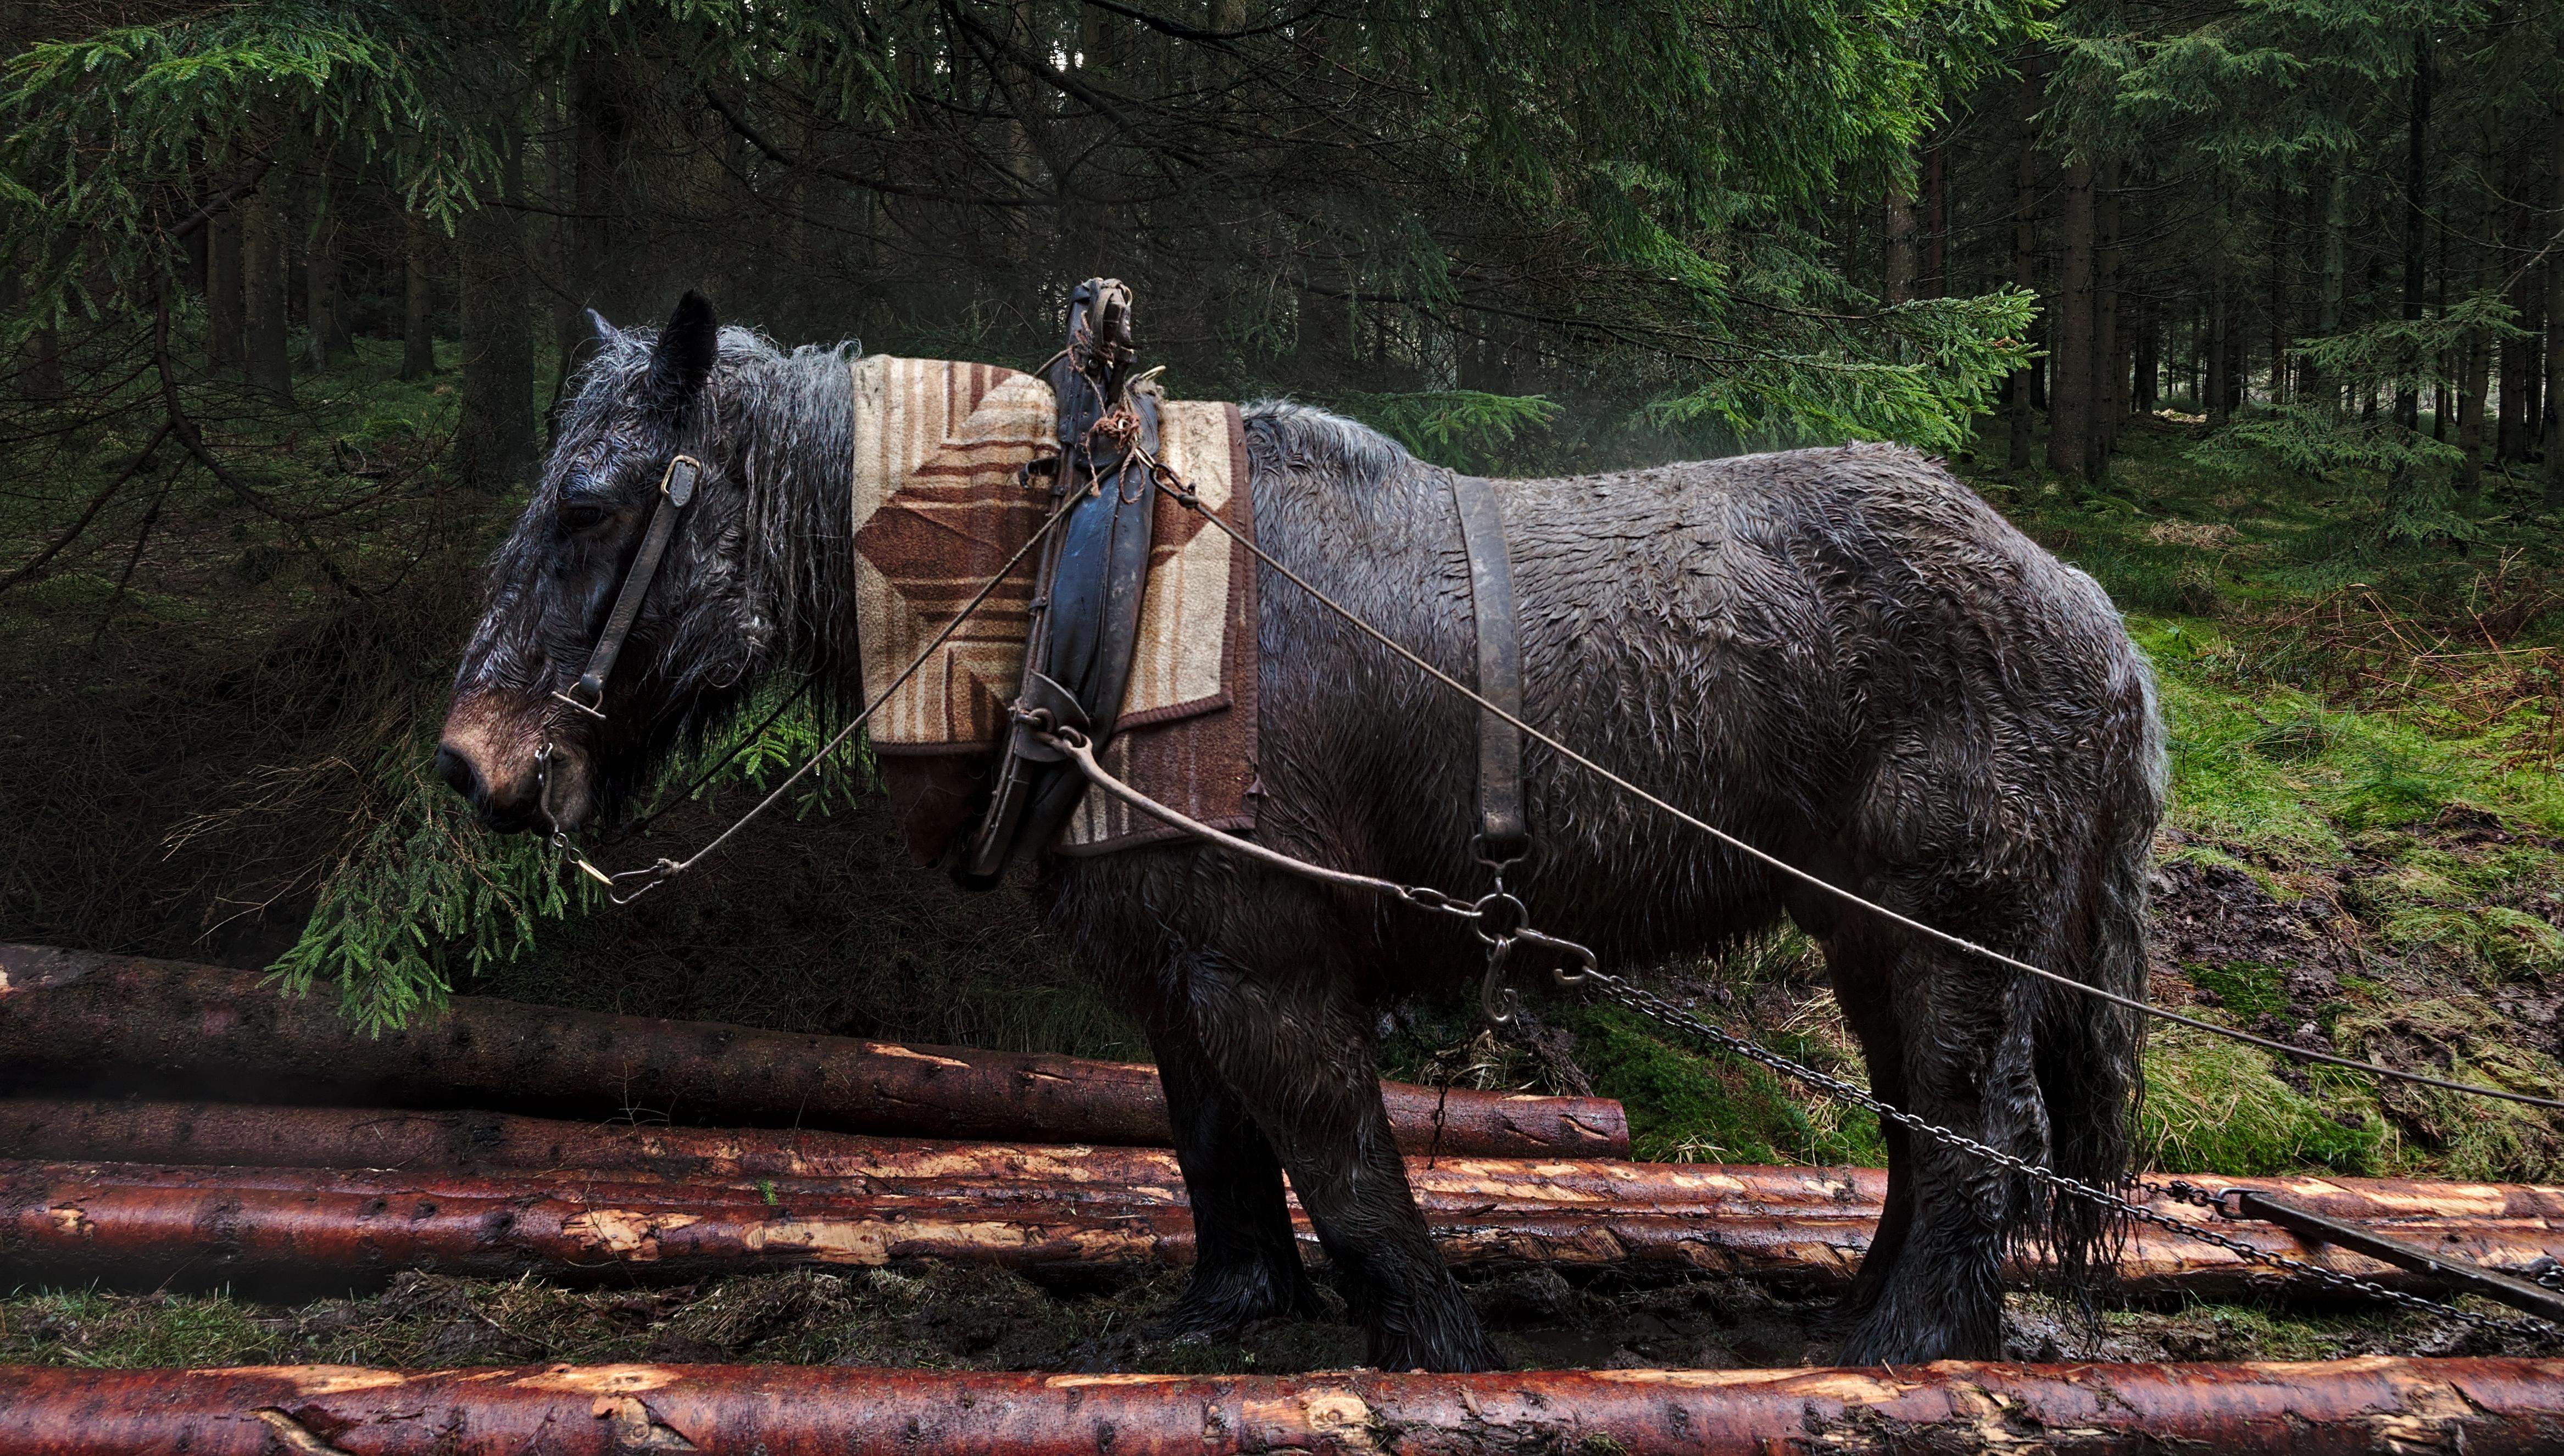 File Draft Horse Pulling Logs In Parc Naturel Hautes Fagnes Eupen Belgium Velotour 54 To 55 Dscf3703 Jpg Wikimedia Commons